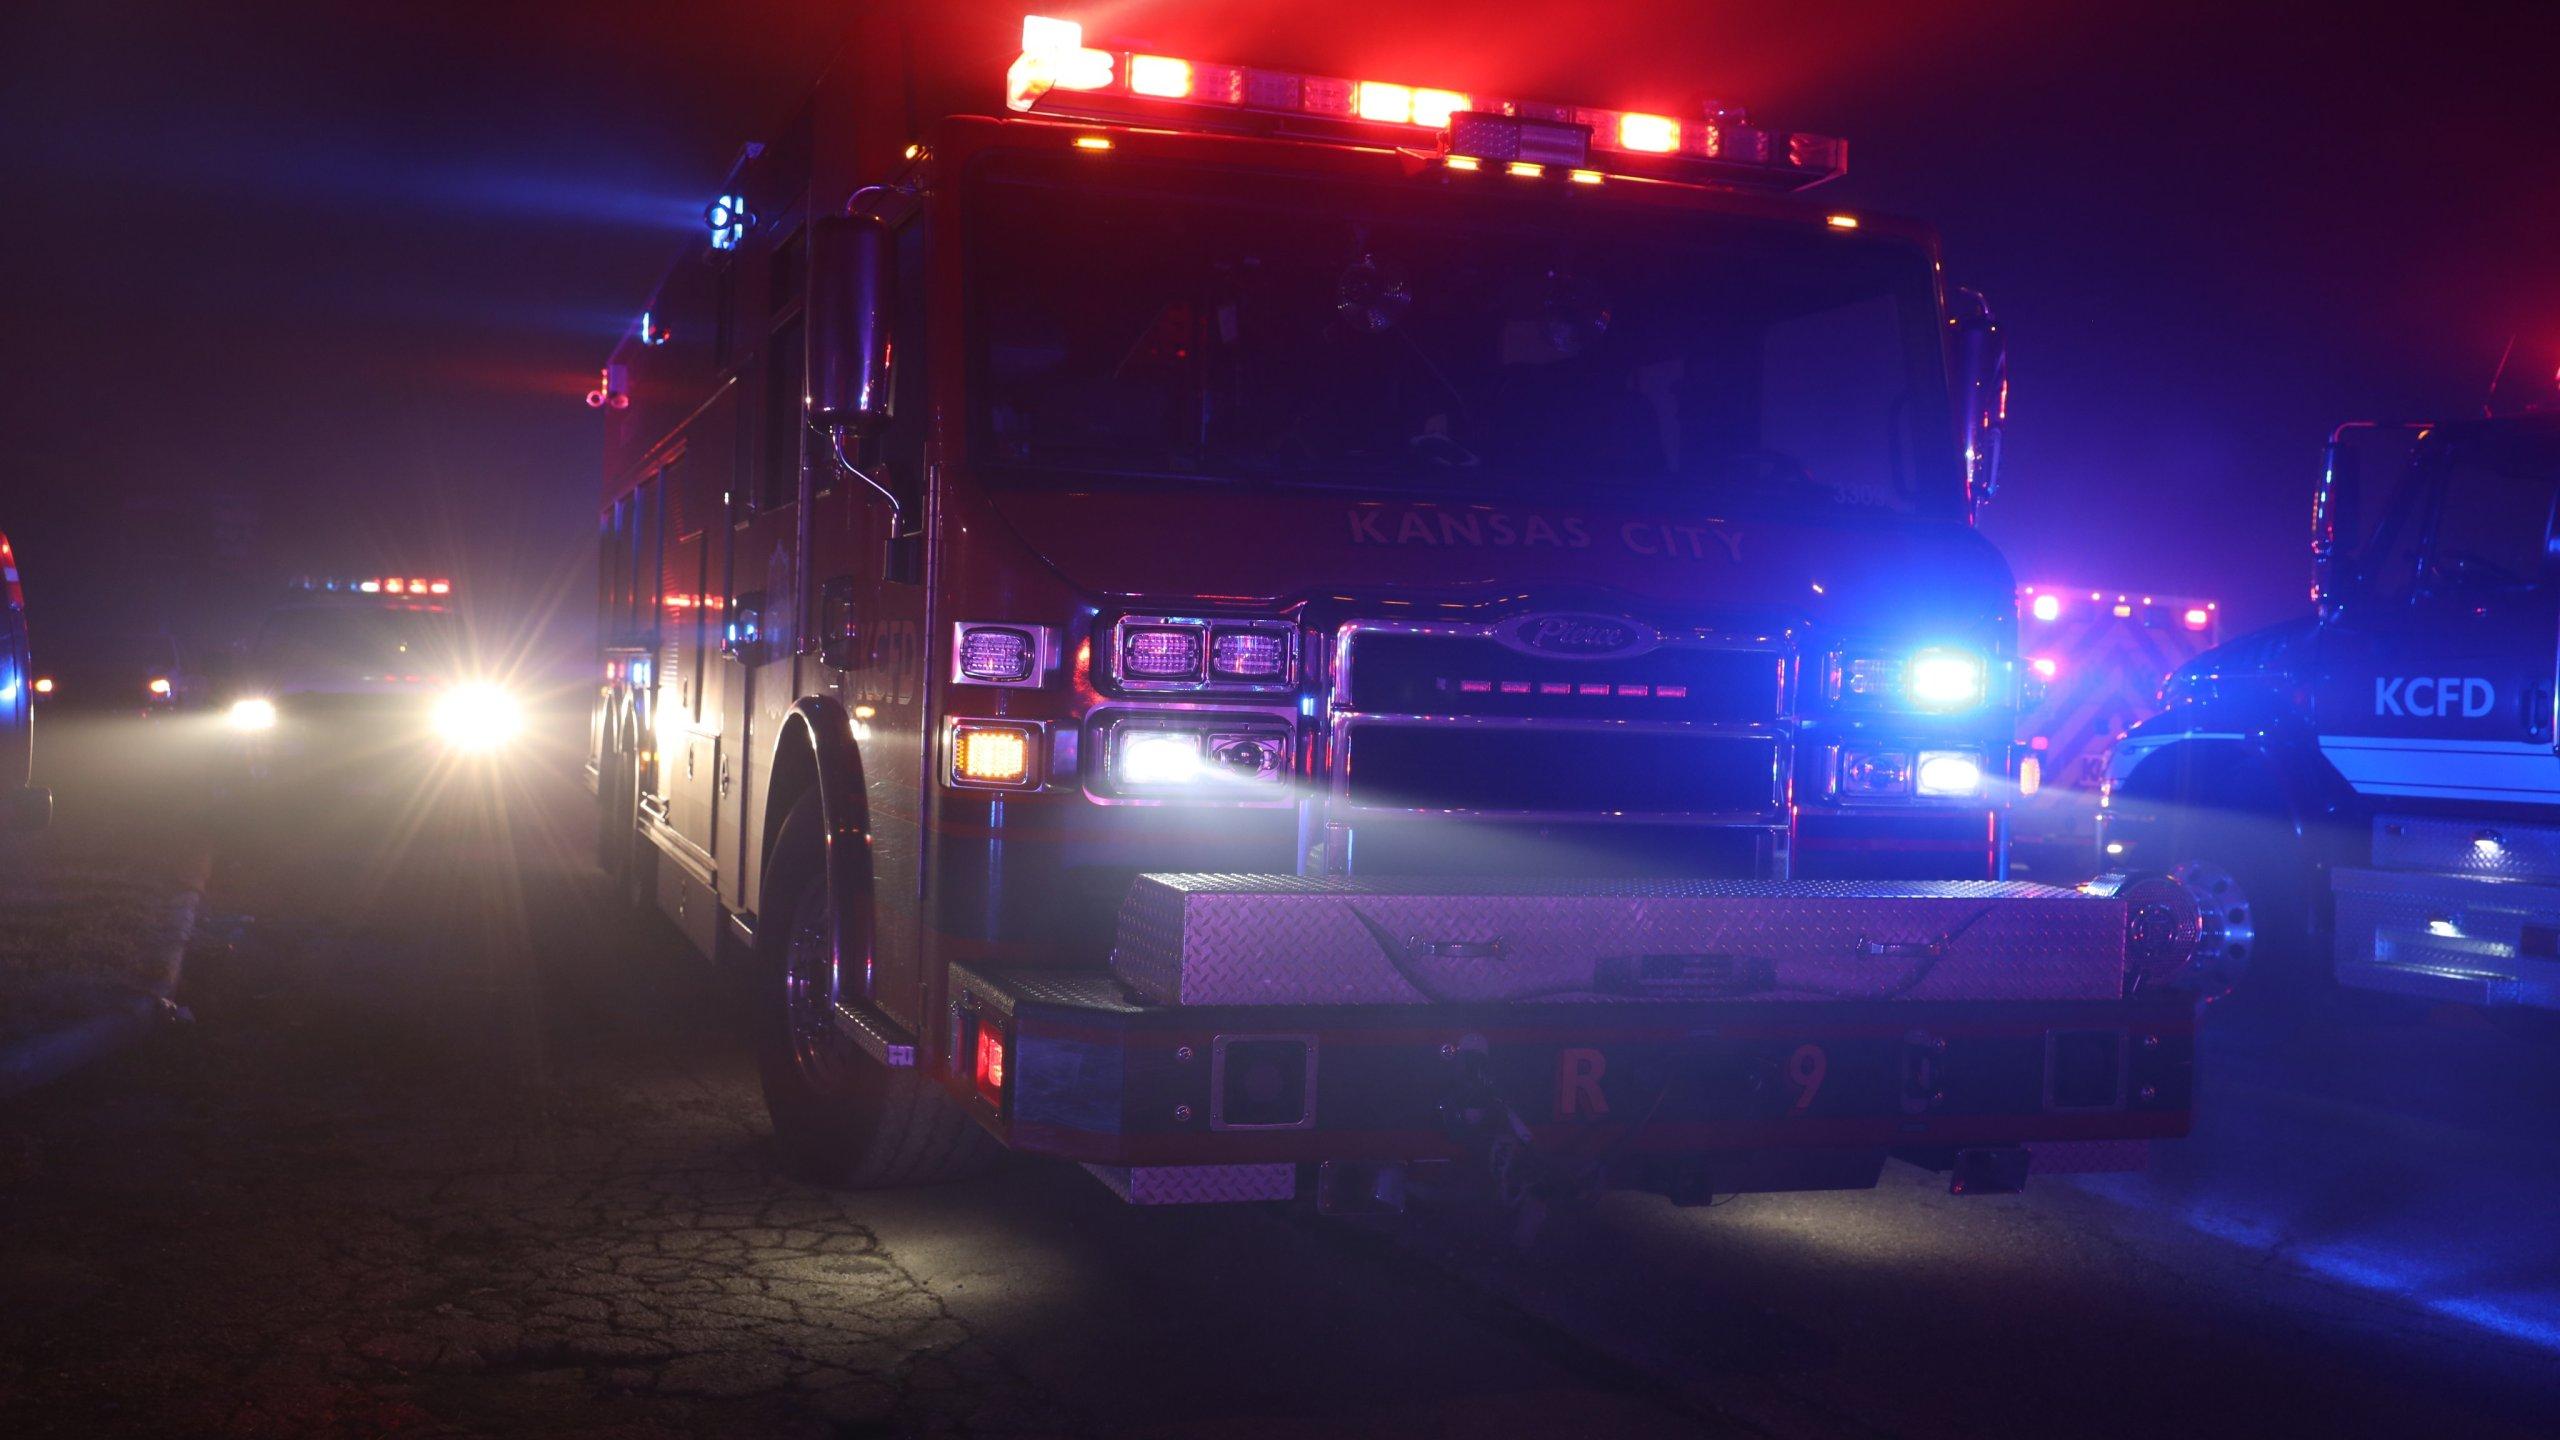 Firetruck in Kansas City, Missouri